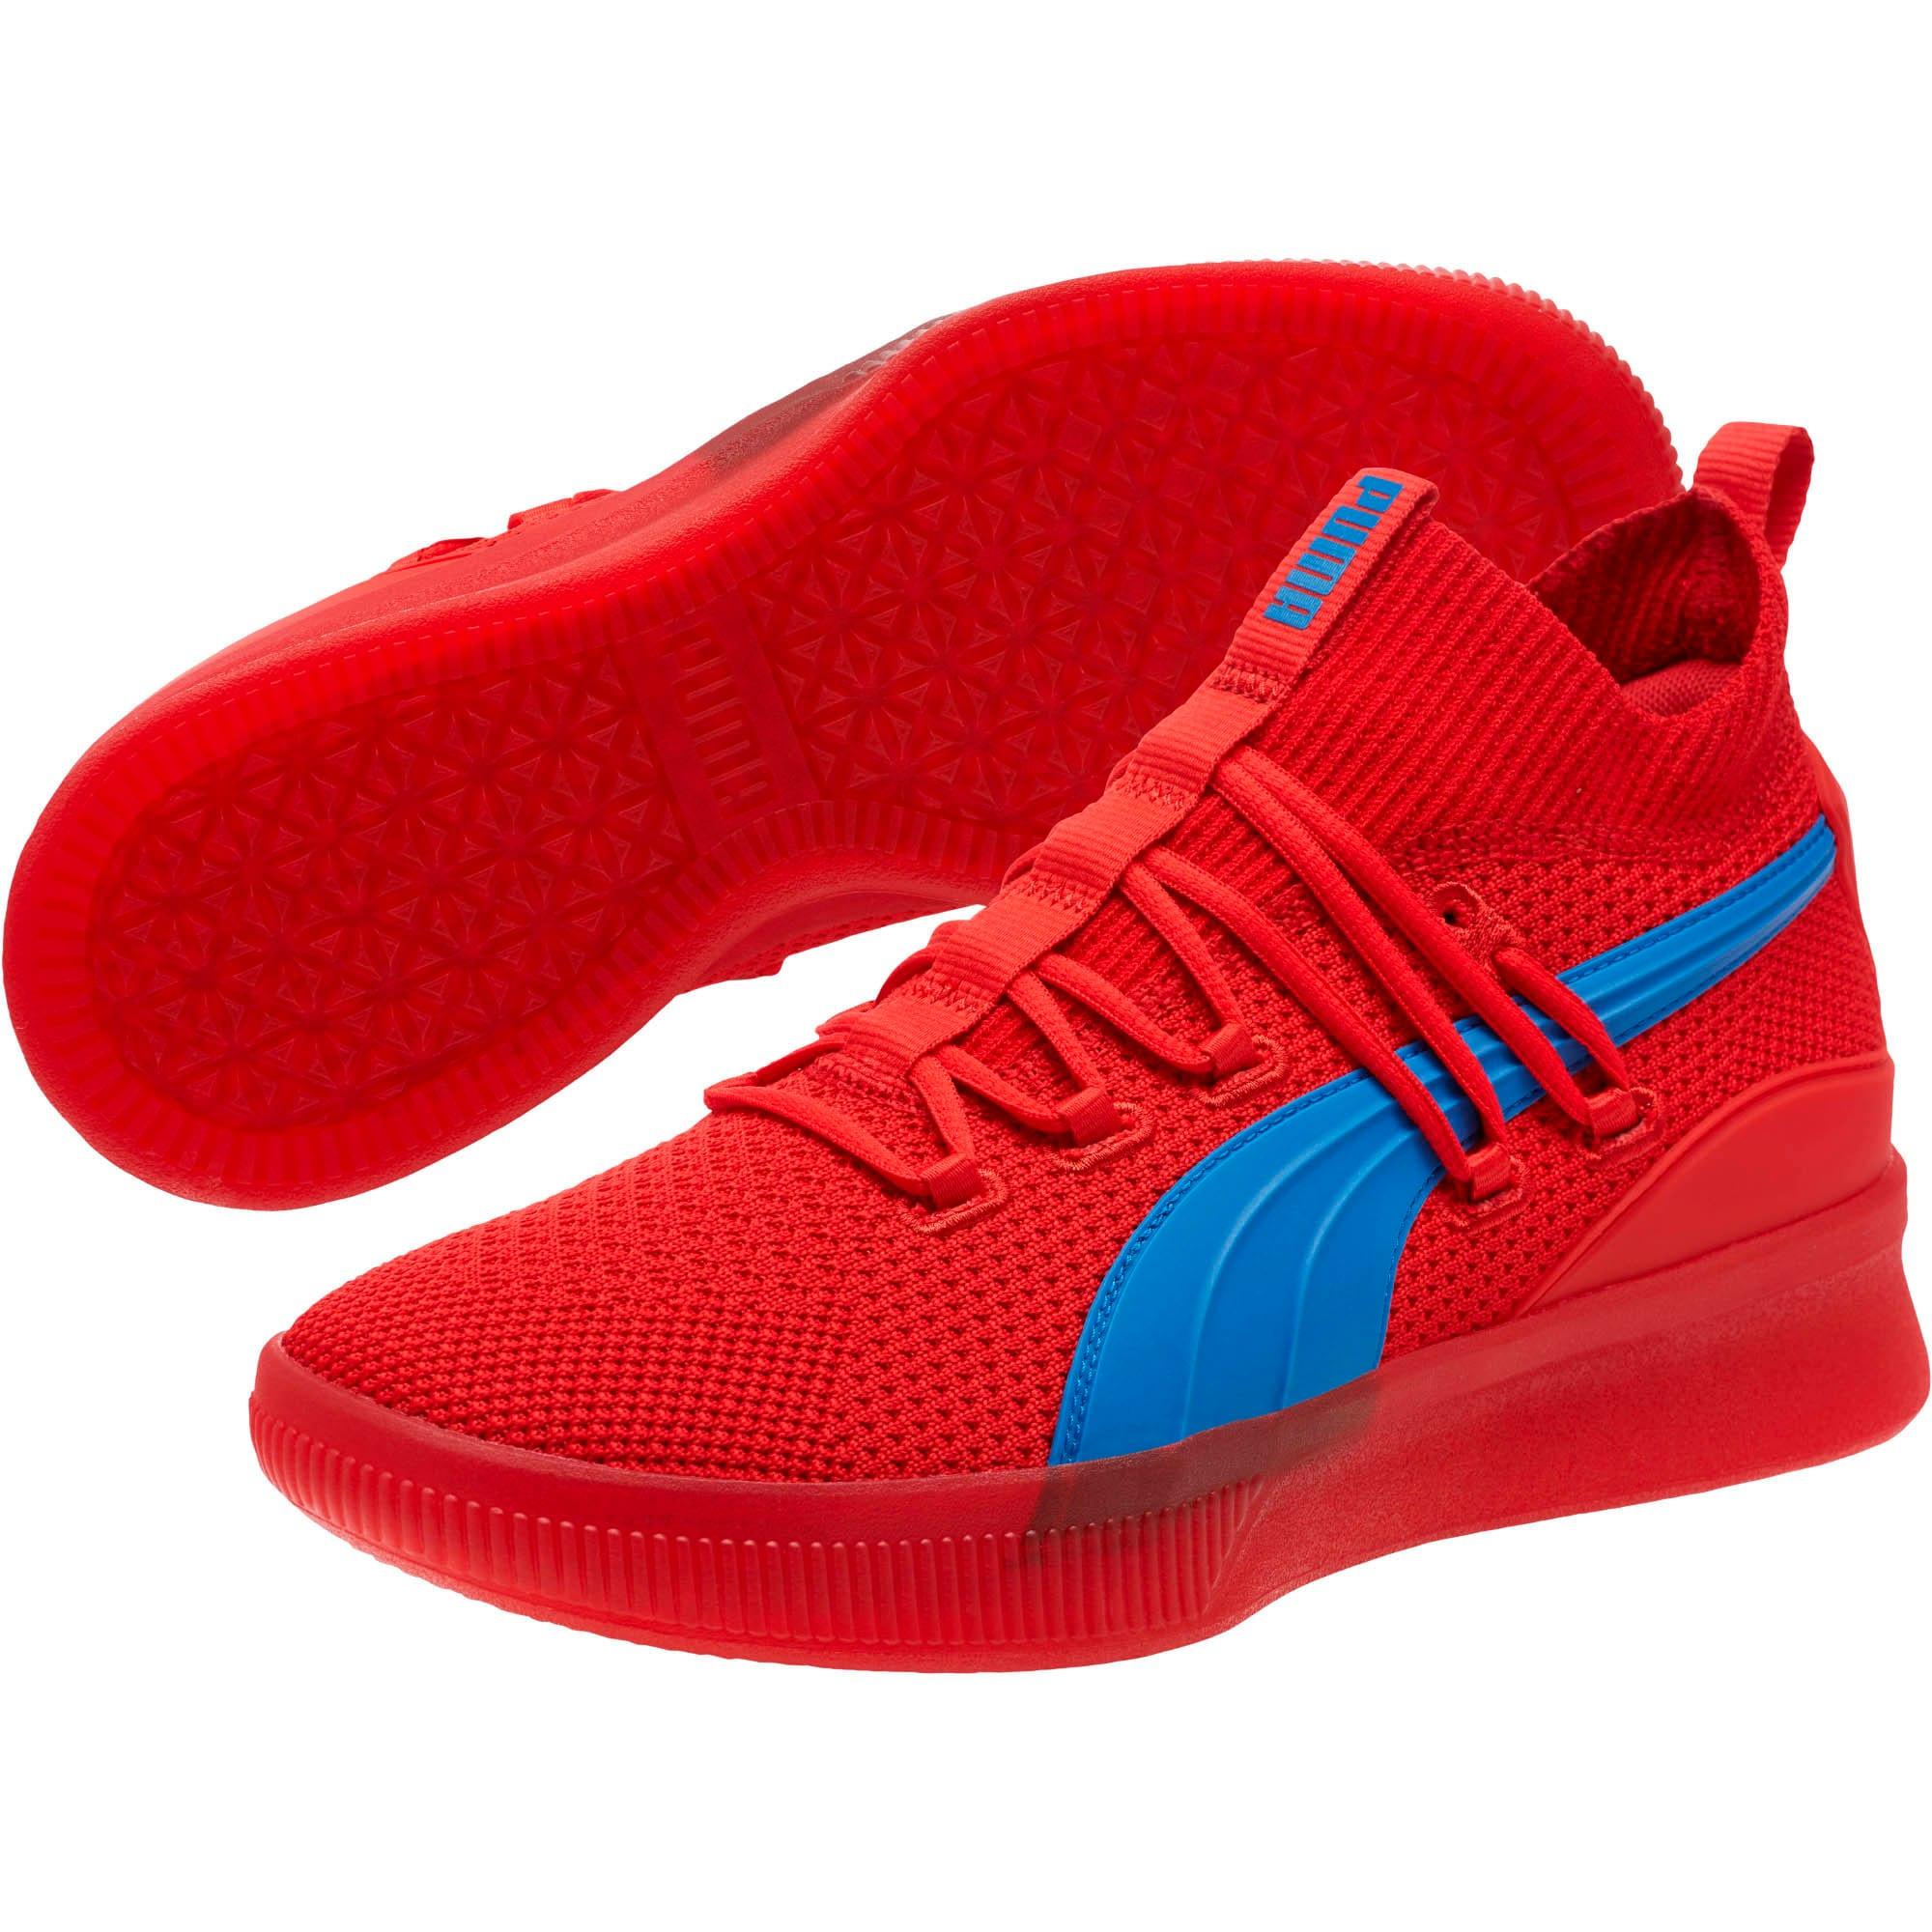 Miniatura 2 de ZapatosClyde Court Core Basketball, High Risk Red-Strong Blue, mediano